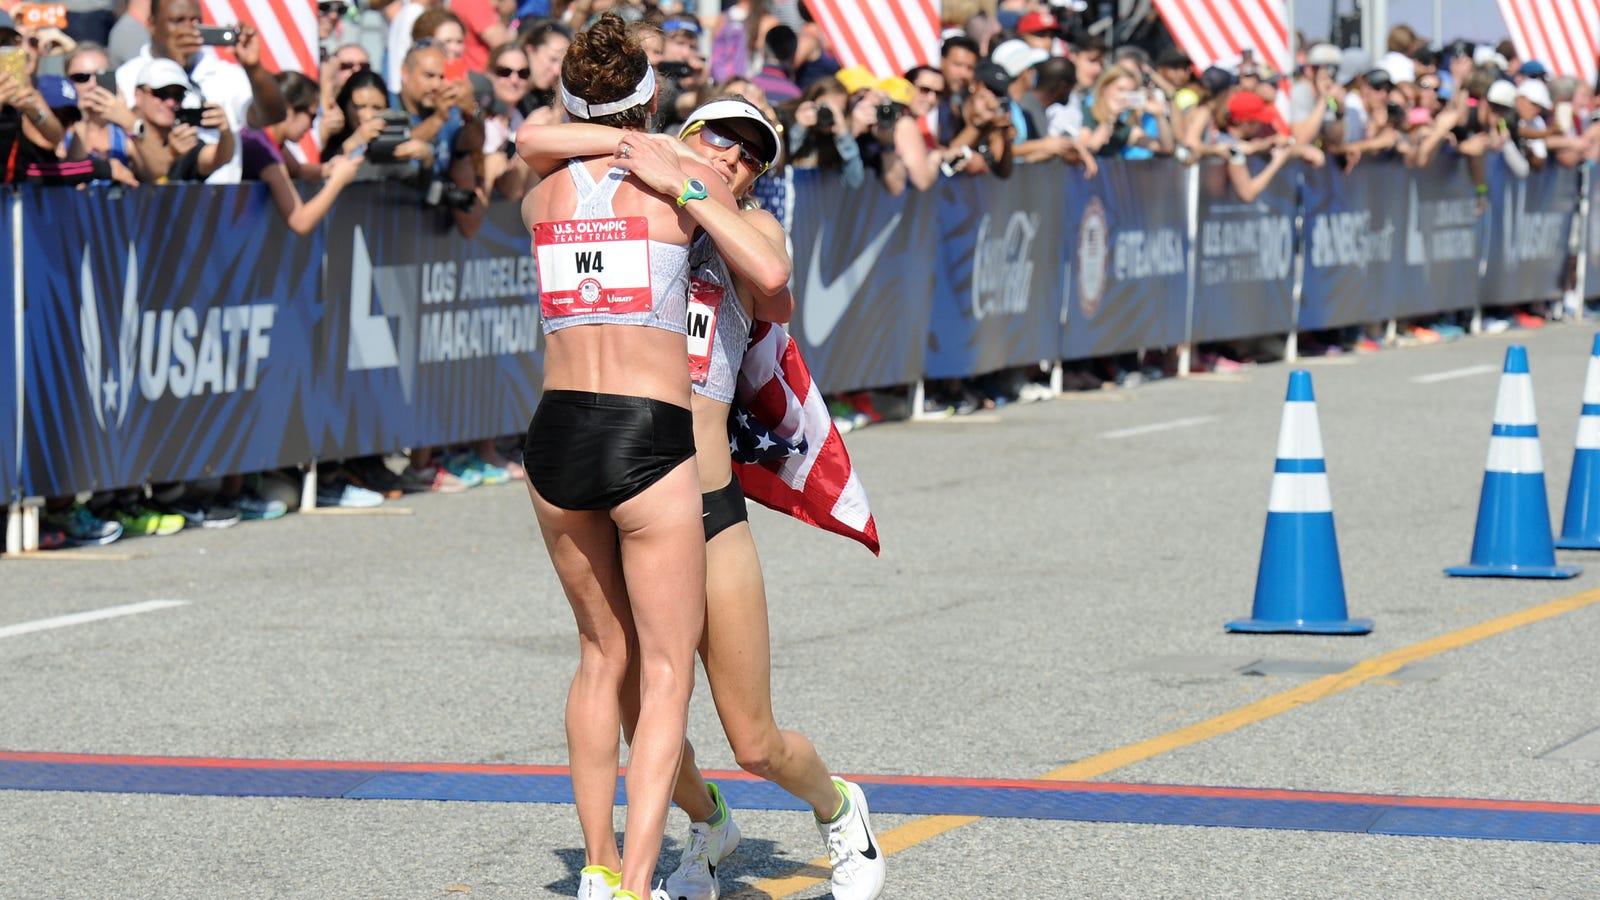 ac155a1fd24d9 The U.S. Olympic Marathon Team  BFFs